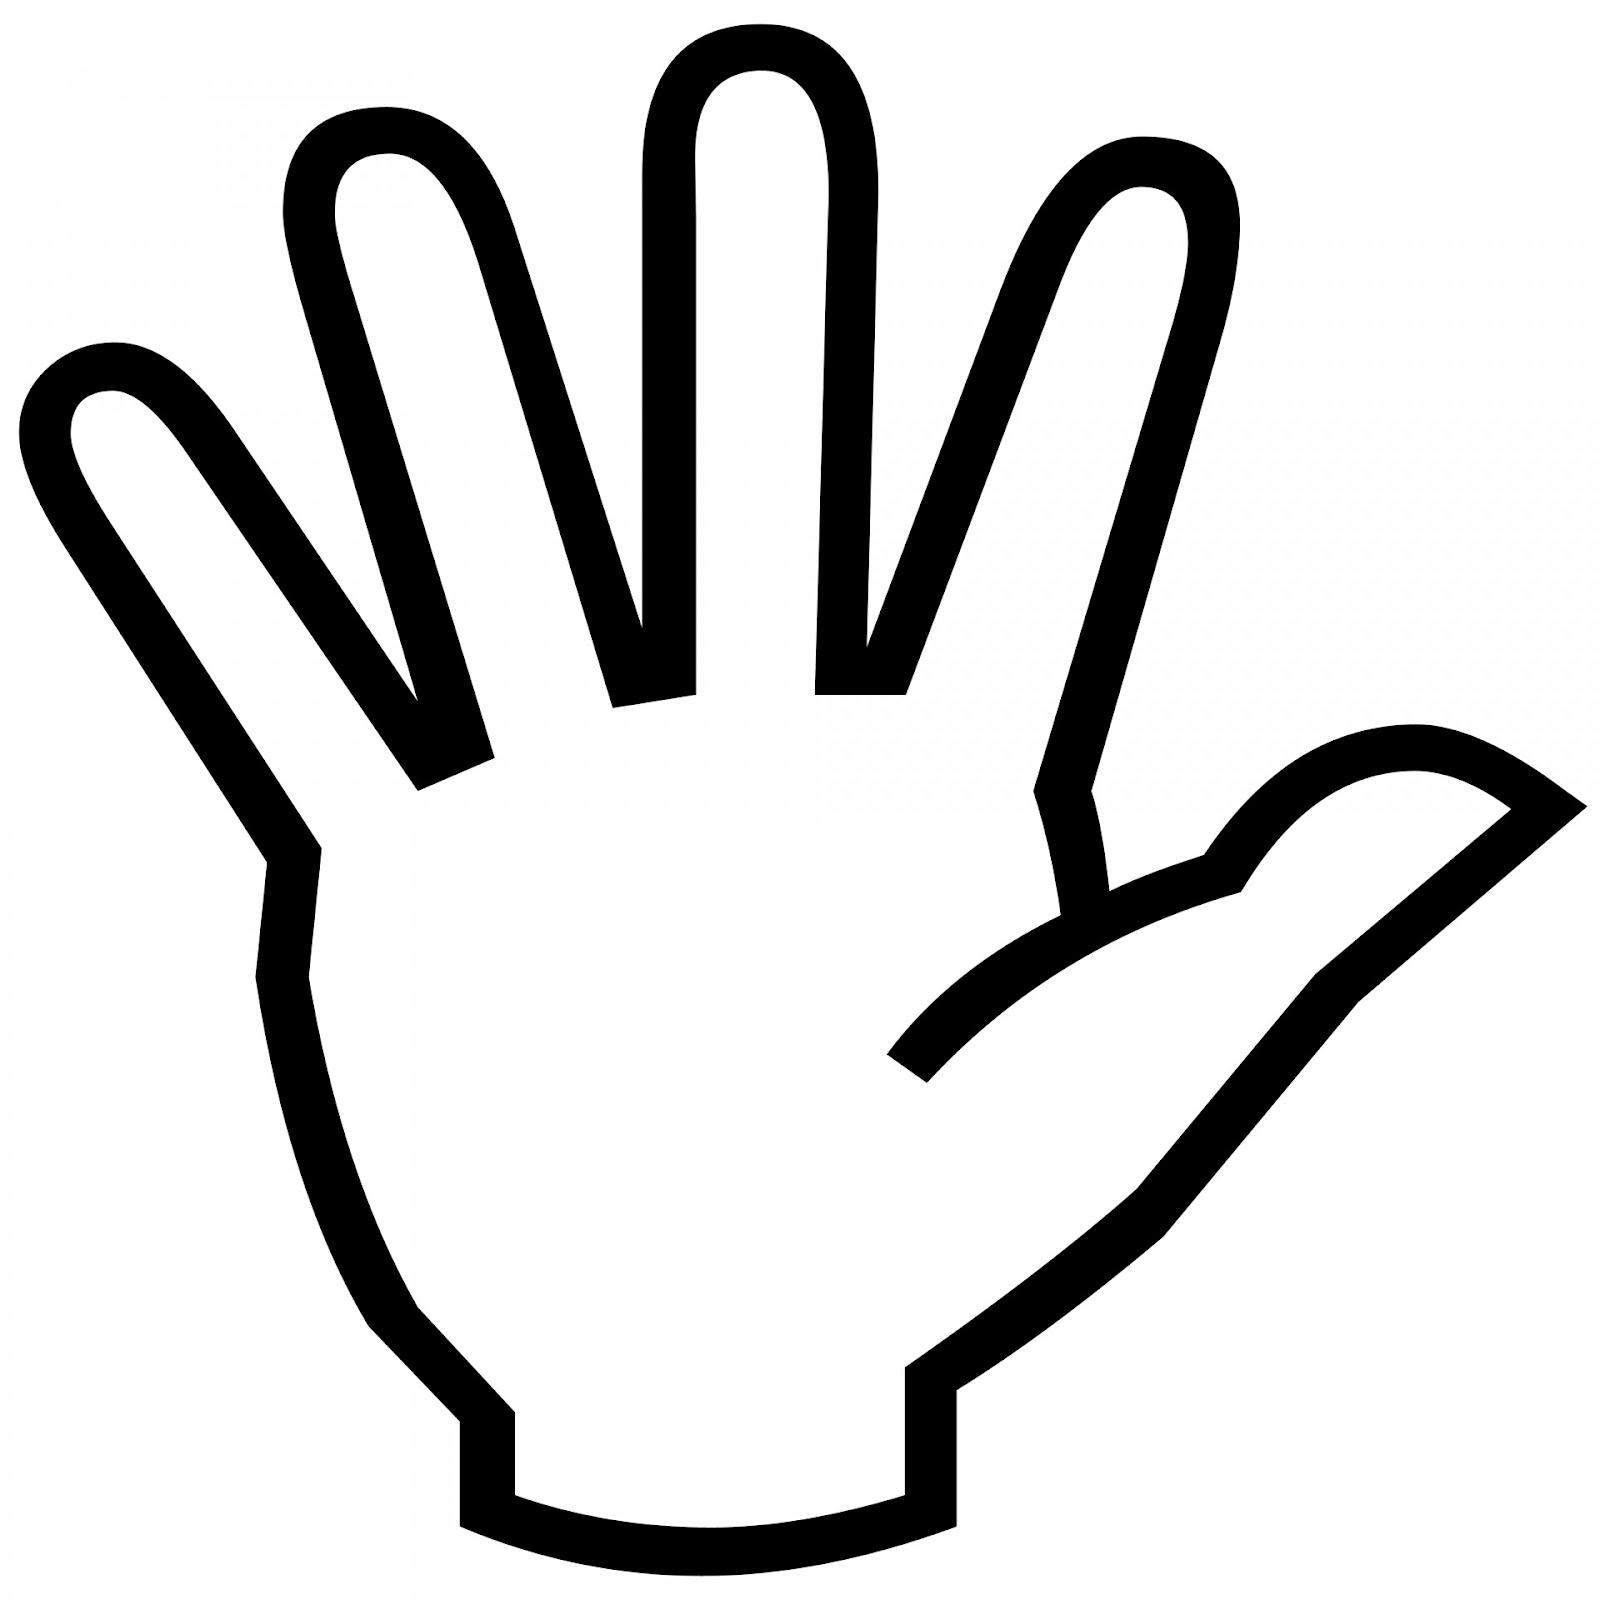 https://www.publicdomainpictures.net/pictures/50000/velka/hand-symbol-silhouette.jpg